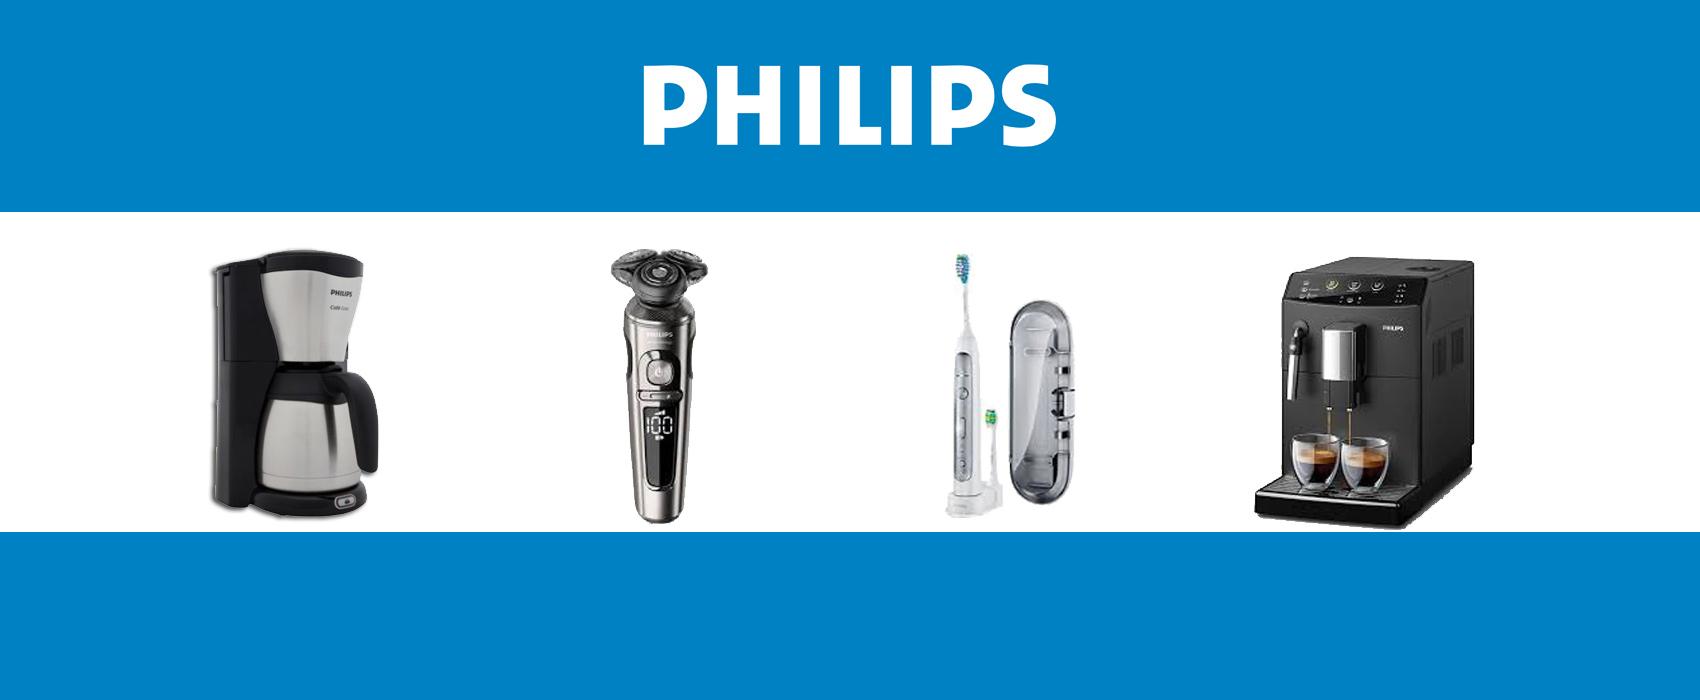 Que vaut la marque Philips ?